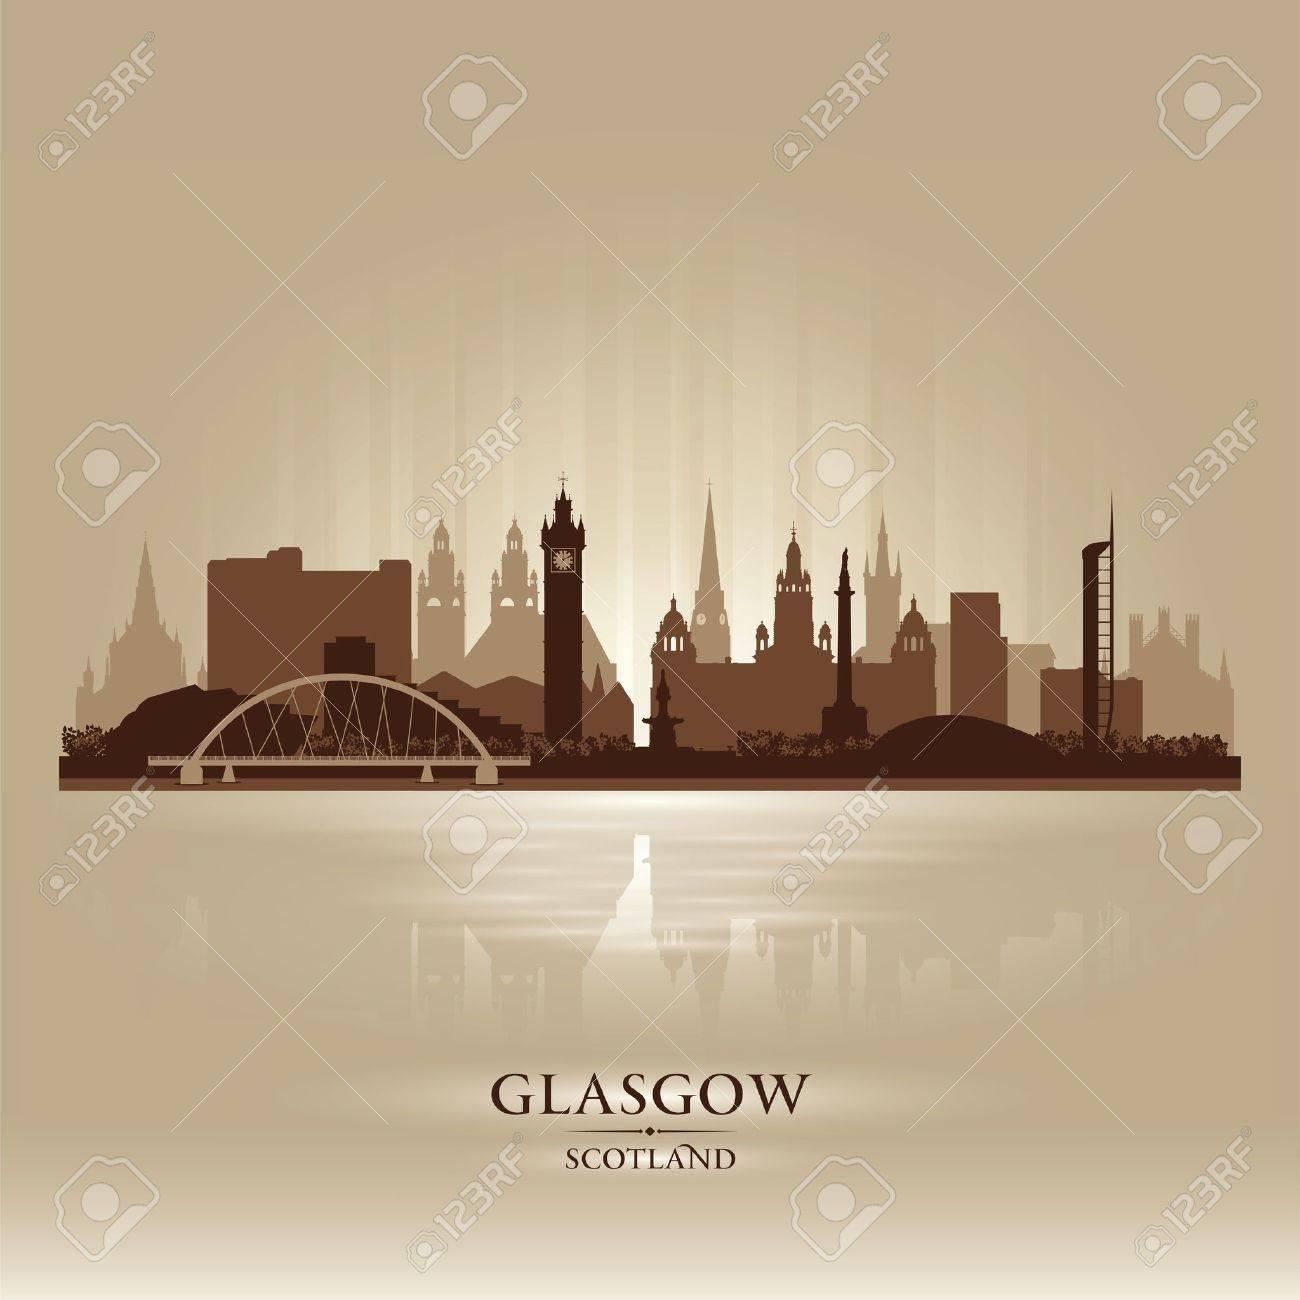 Glasgow Scotland skyline city silhouette illustration Stock Vector - 19027338